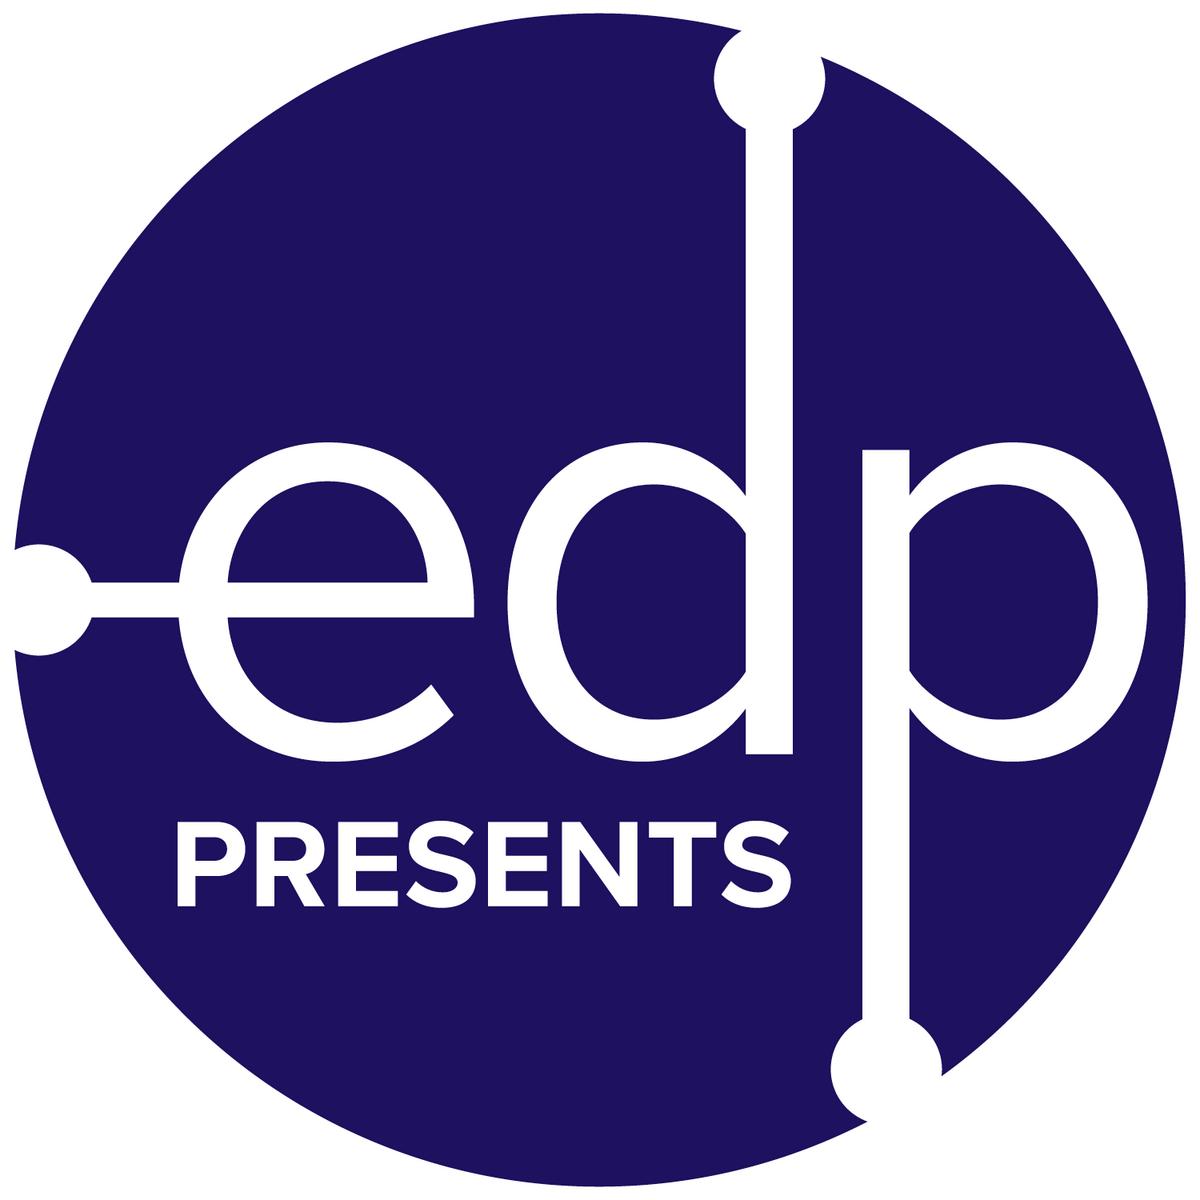 edp presents logo